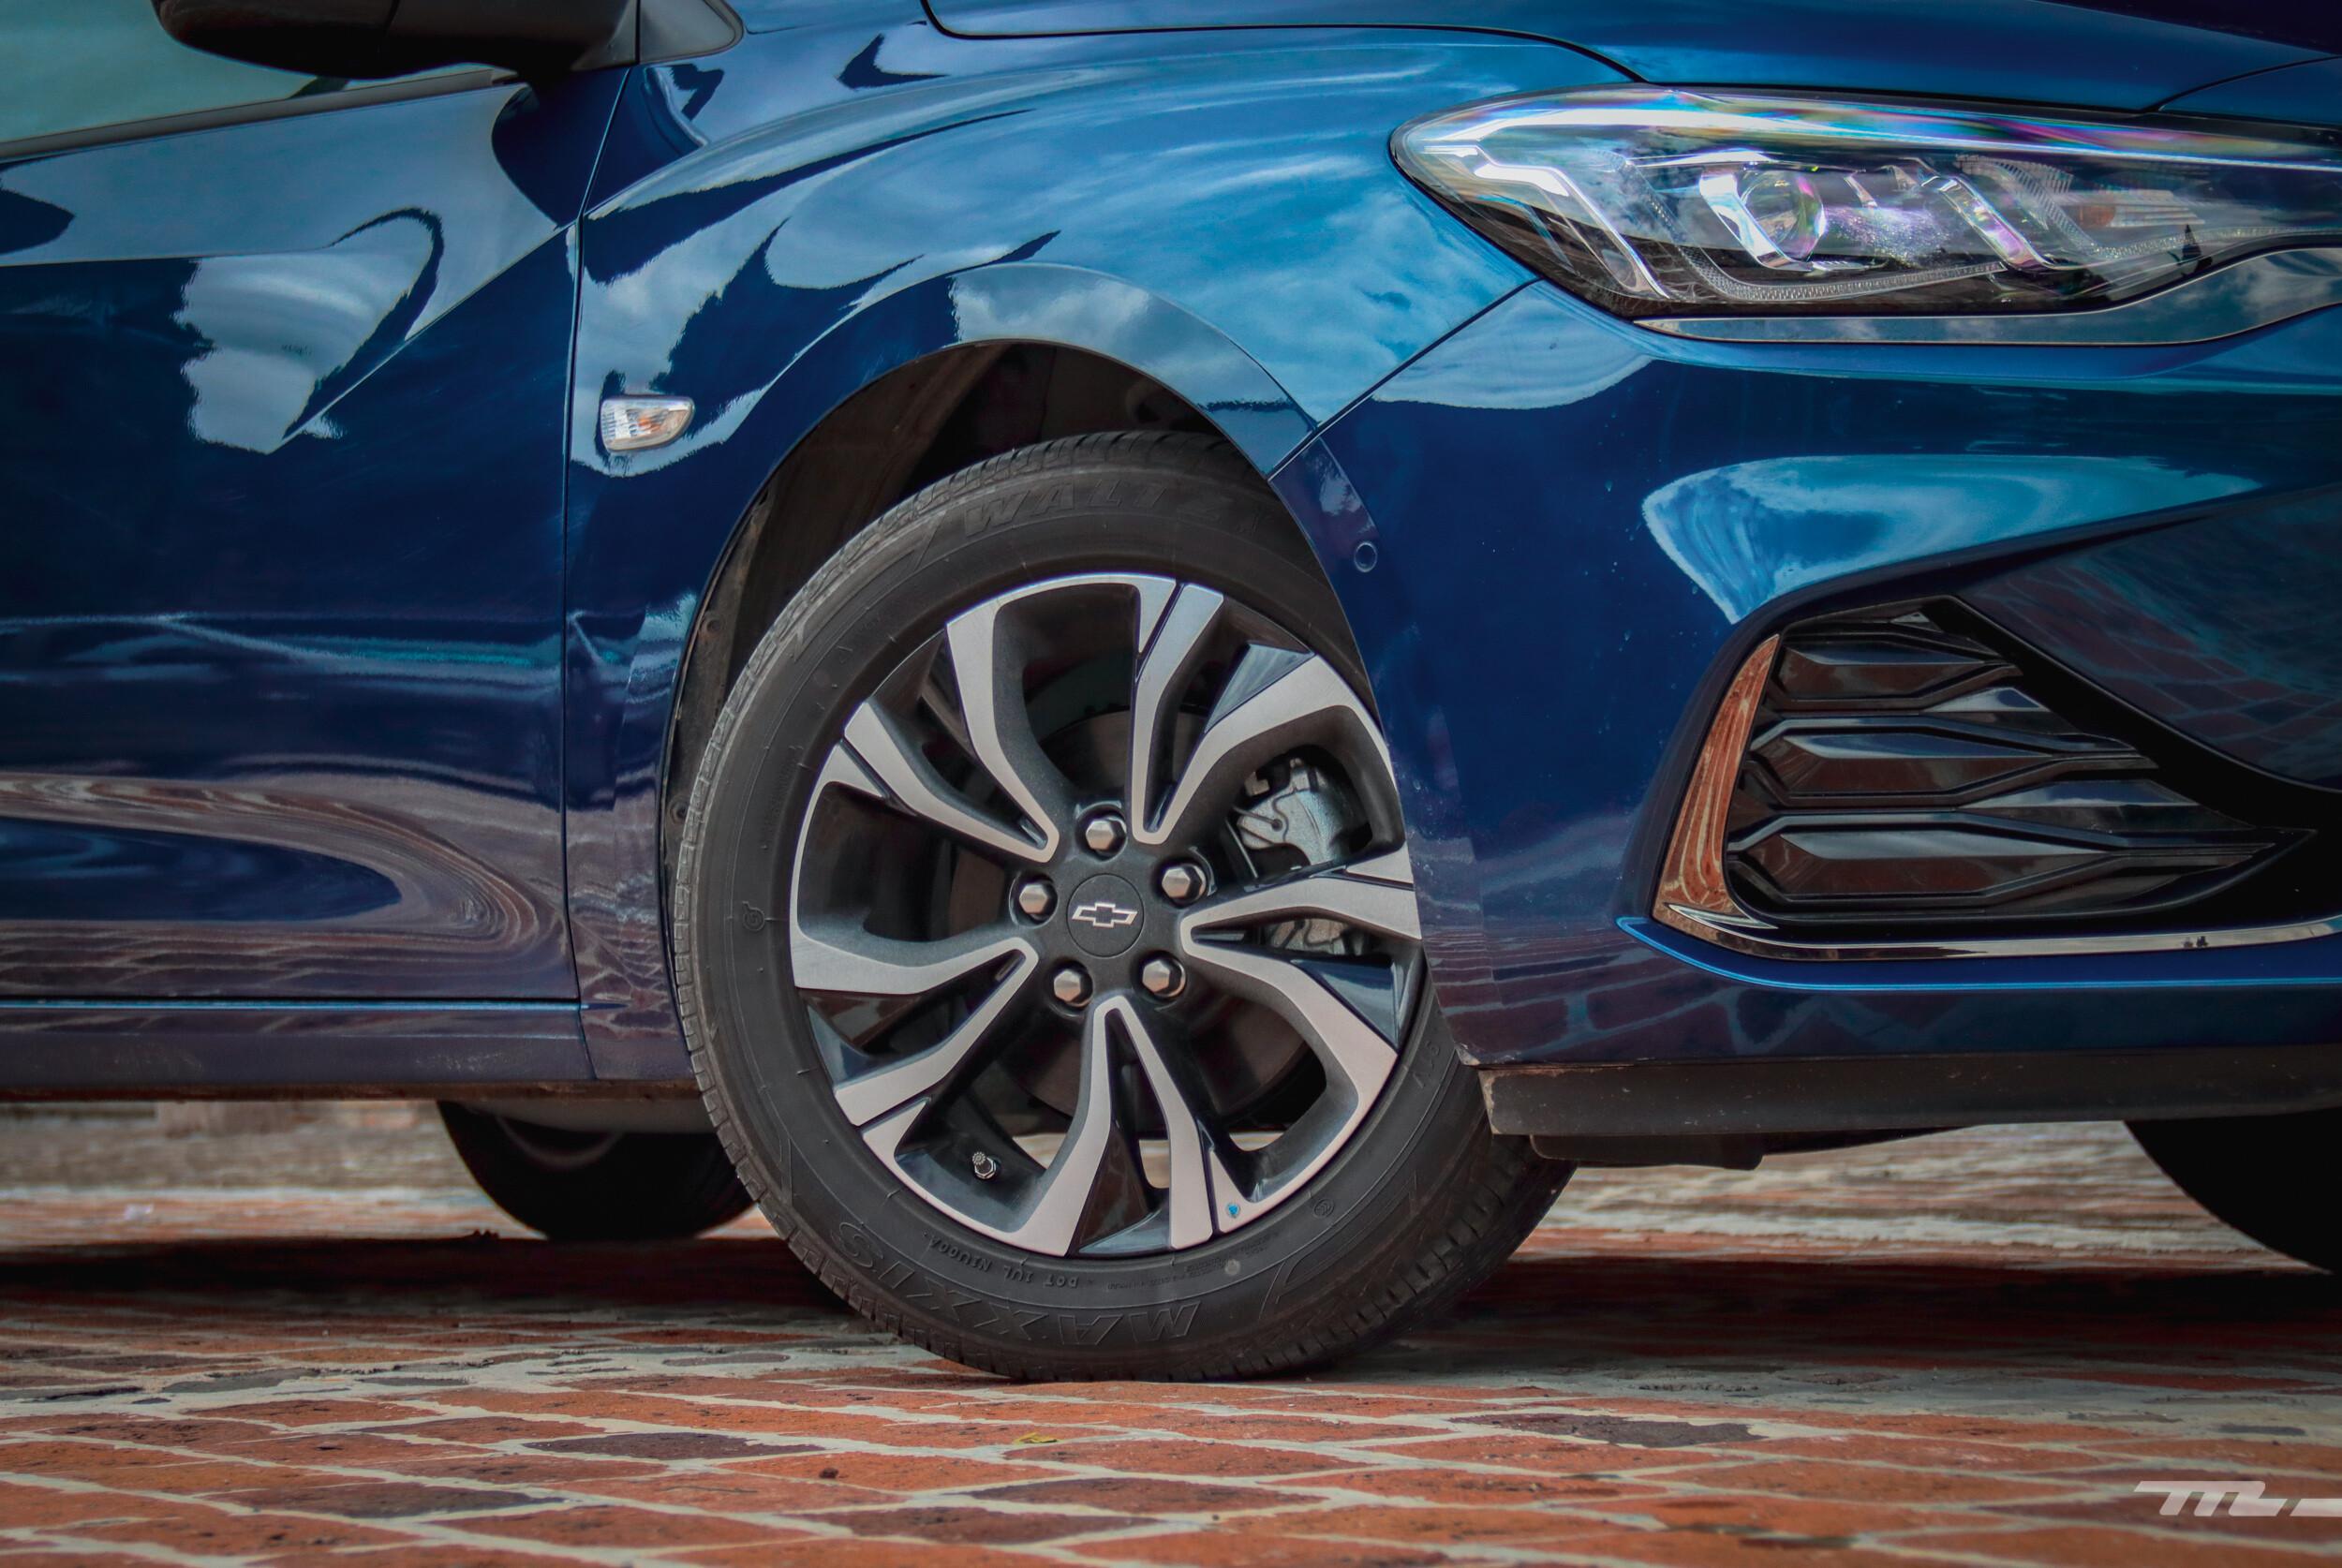 Foto de Chevrolet Cavalier Turbo 2022: Primer vistazo (21/37)